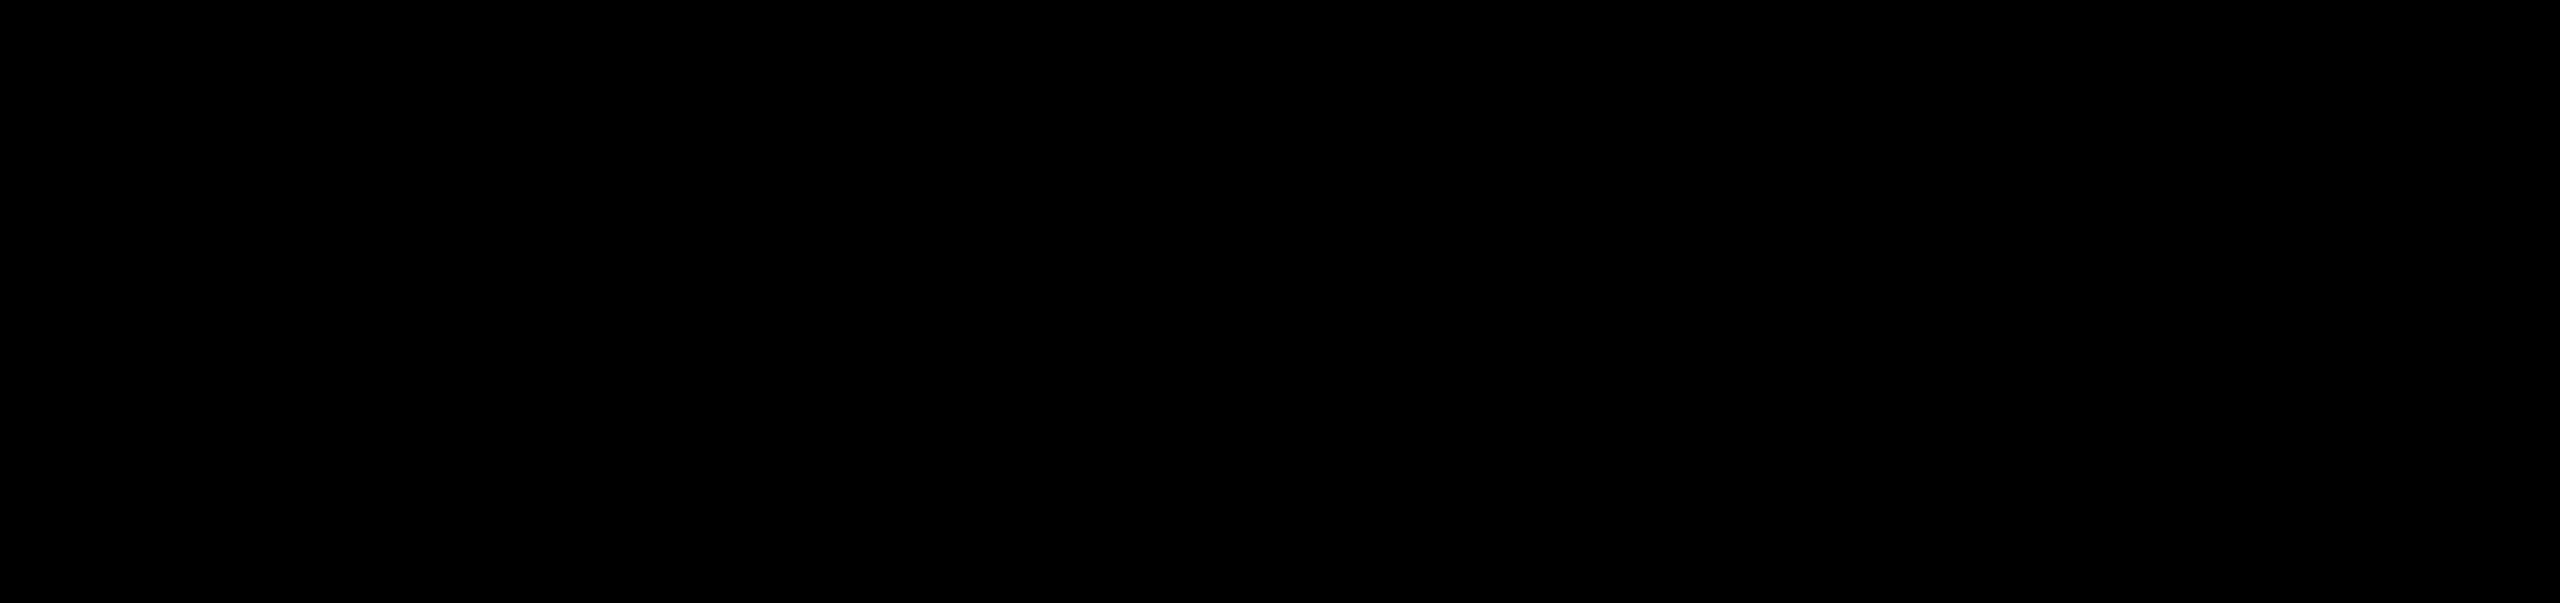 Llaunes 170 x 40 cm